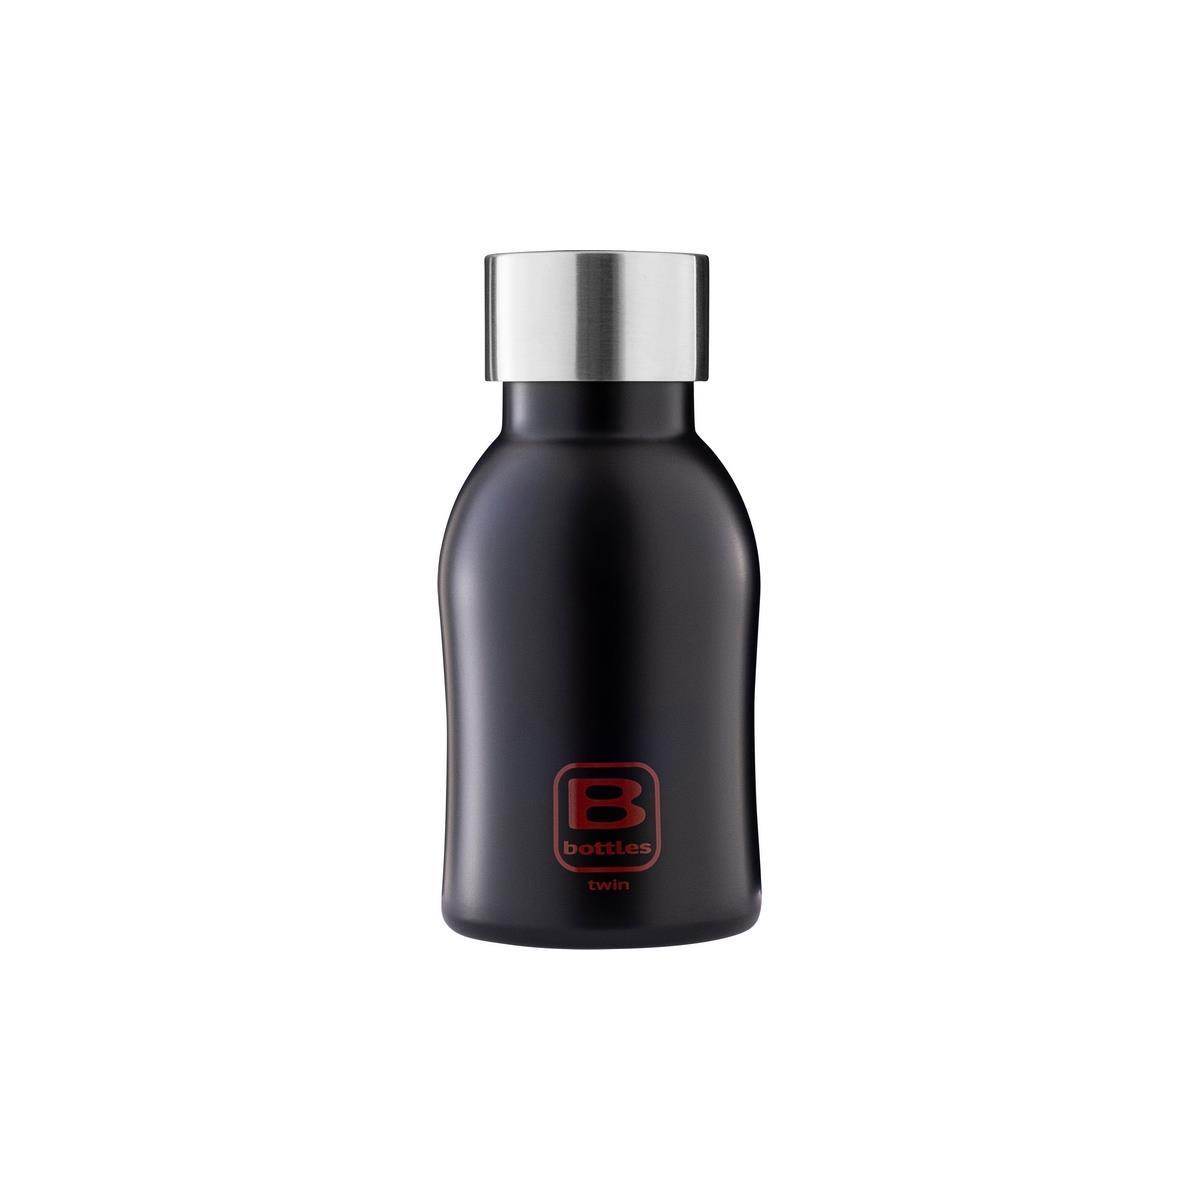 B Bottles Twin - Nero Opaco - 250 ml - Bottiglia Termica a doppia parete in acciaio inox 18/10